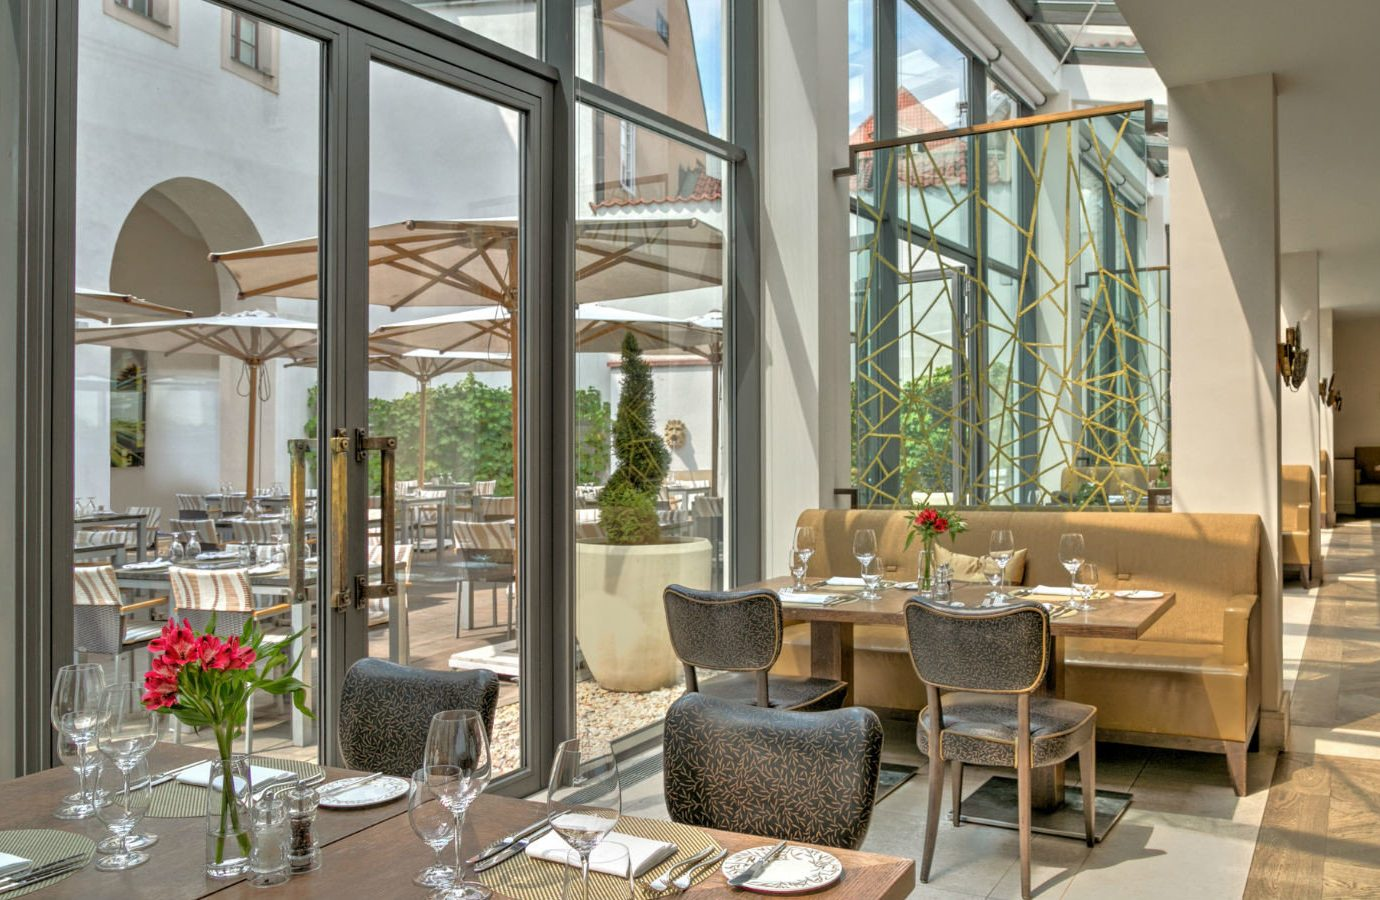 europe Hotels Prague restaurant interior design real estate window apartment penthouse apartment Lobby